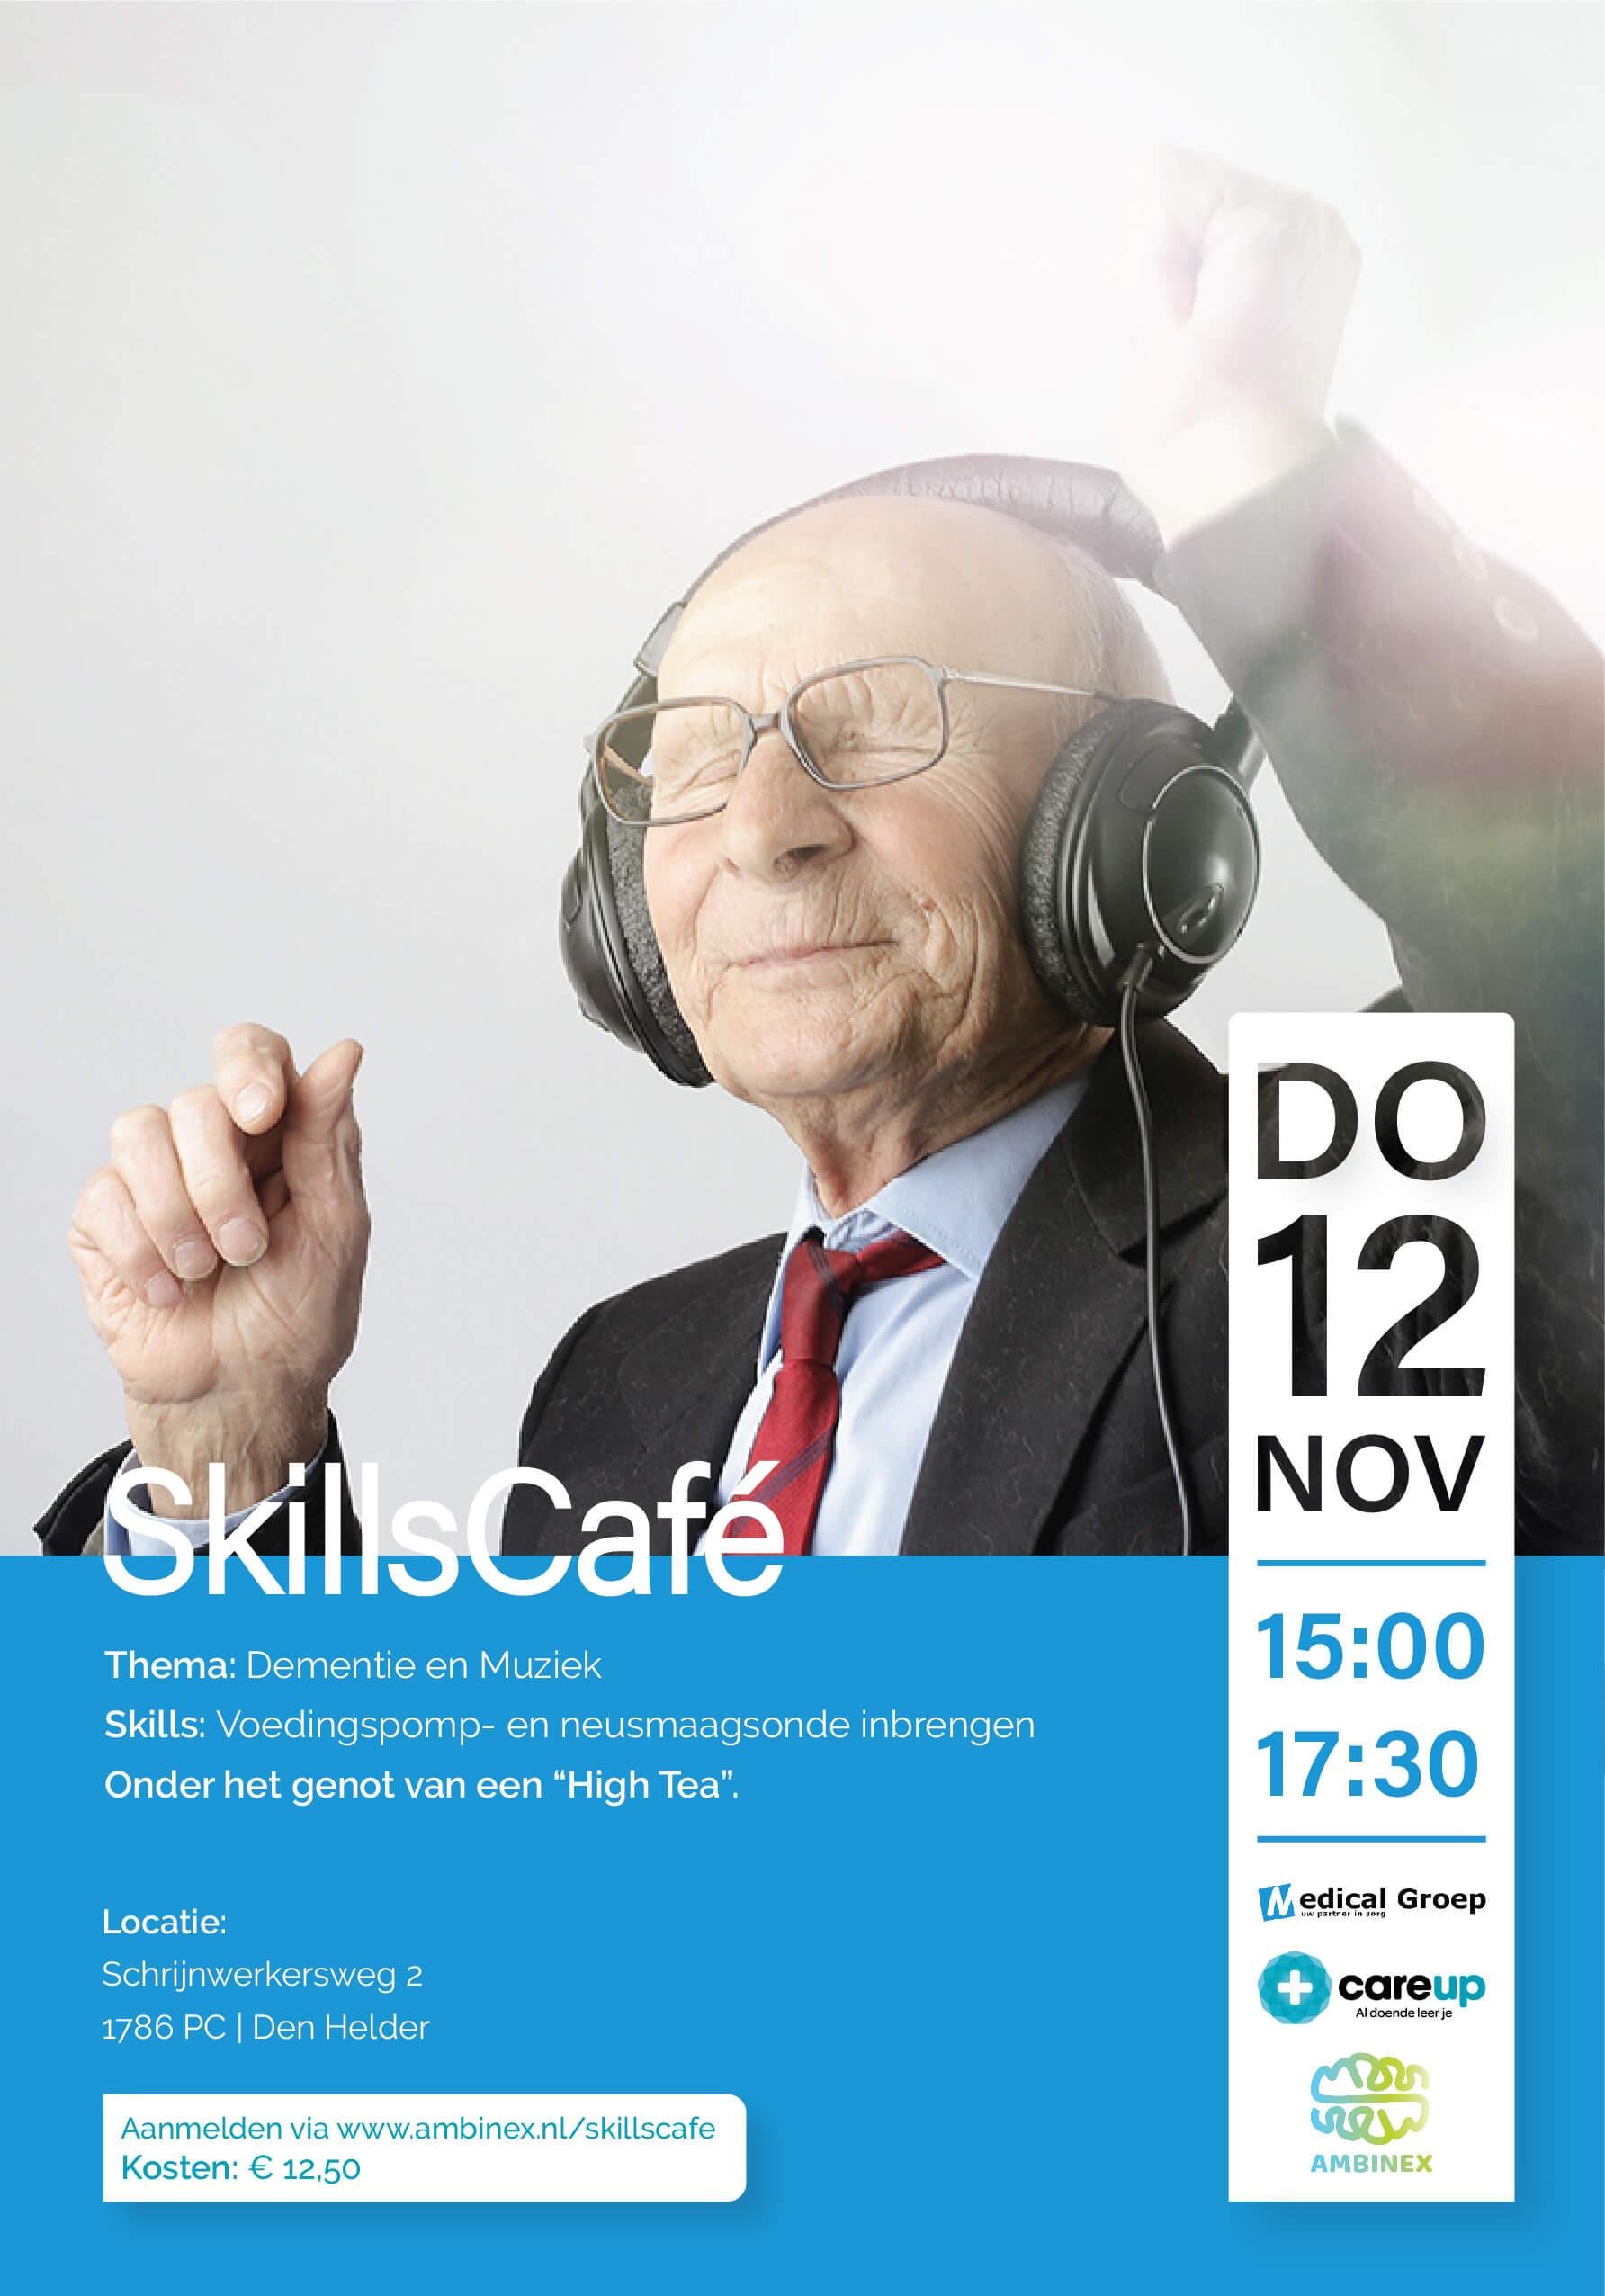 Skillscafé Den Helder - Dementie & muziek - 12 november